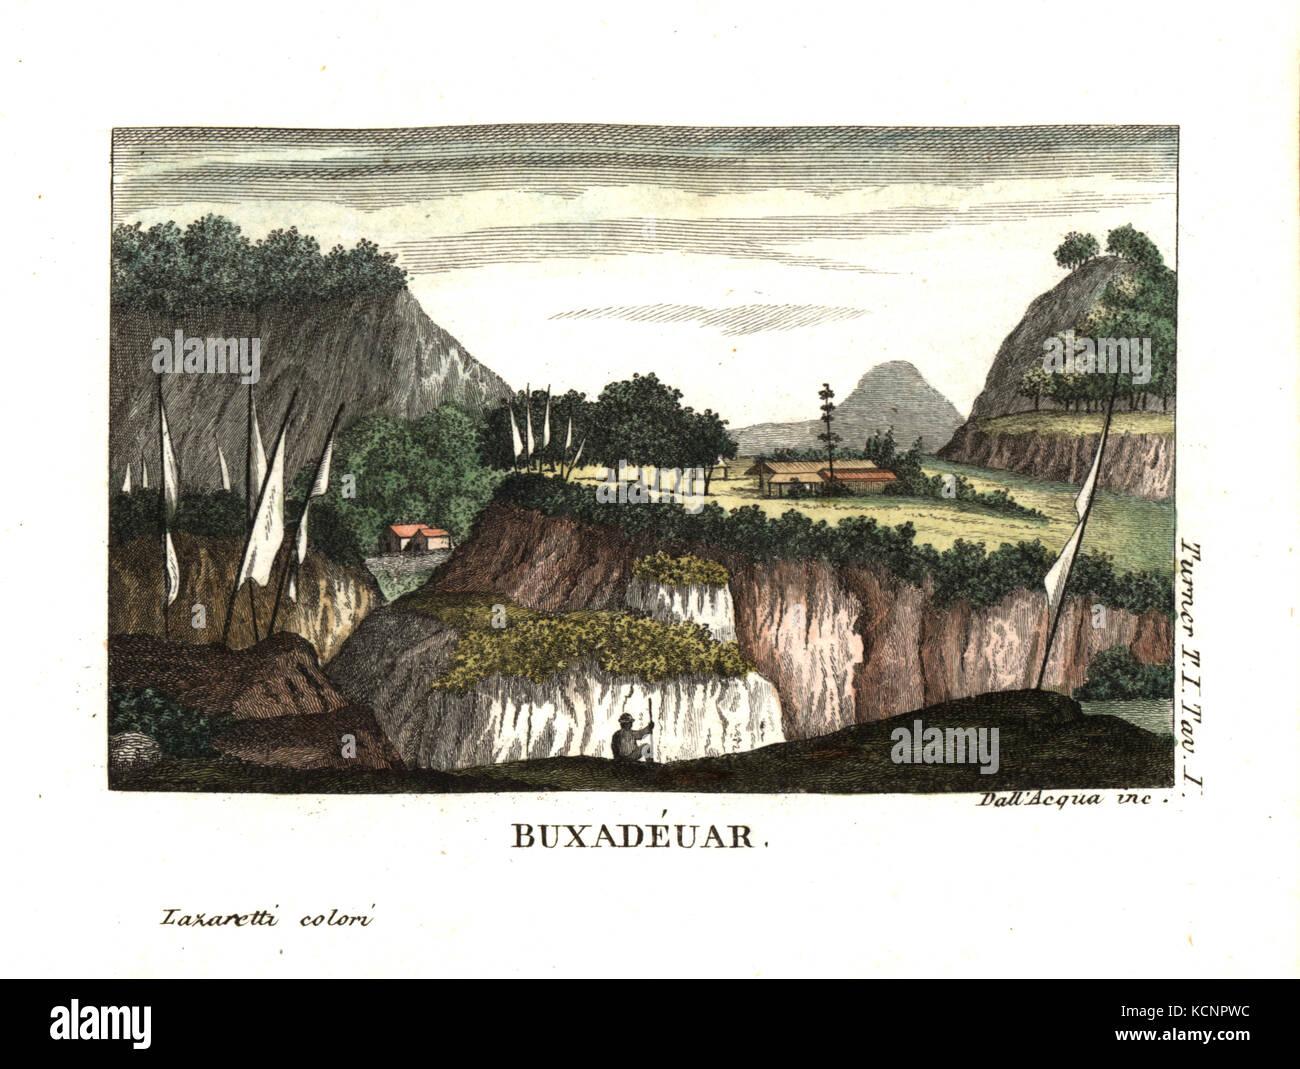 Buxa Duar, Bhutan. Illustration by Lieutenant Samuel Davis from Captain Samuel Turner's Account of an Embassy to - Stock Image